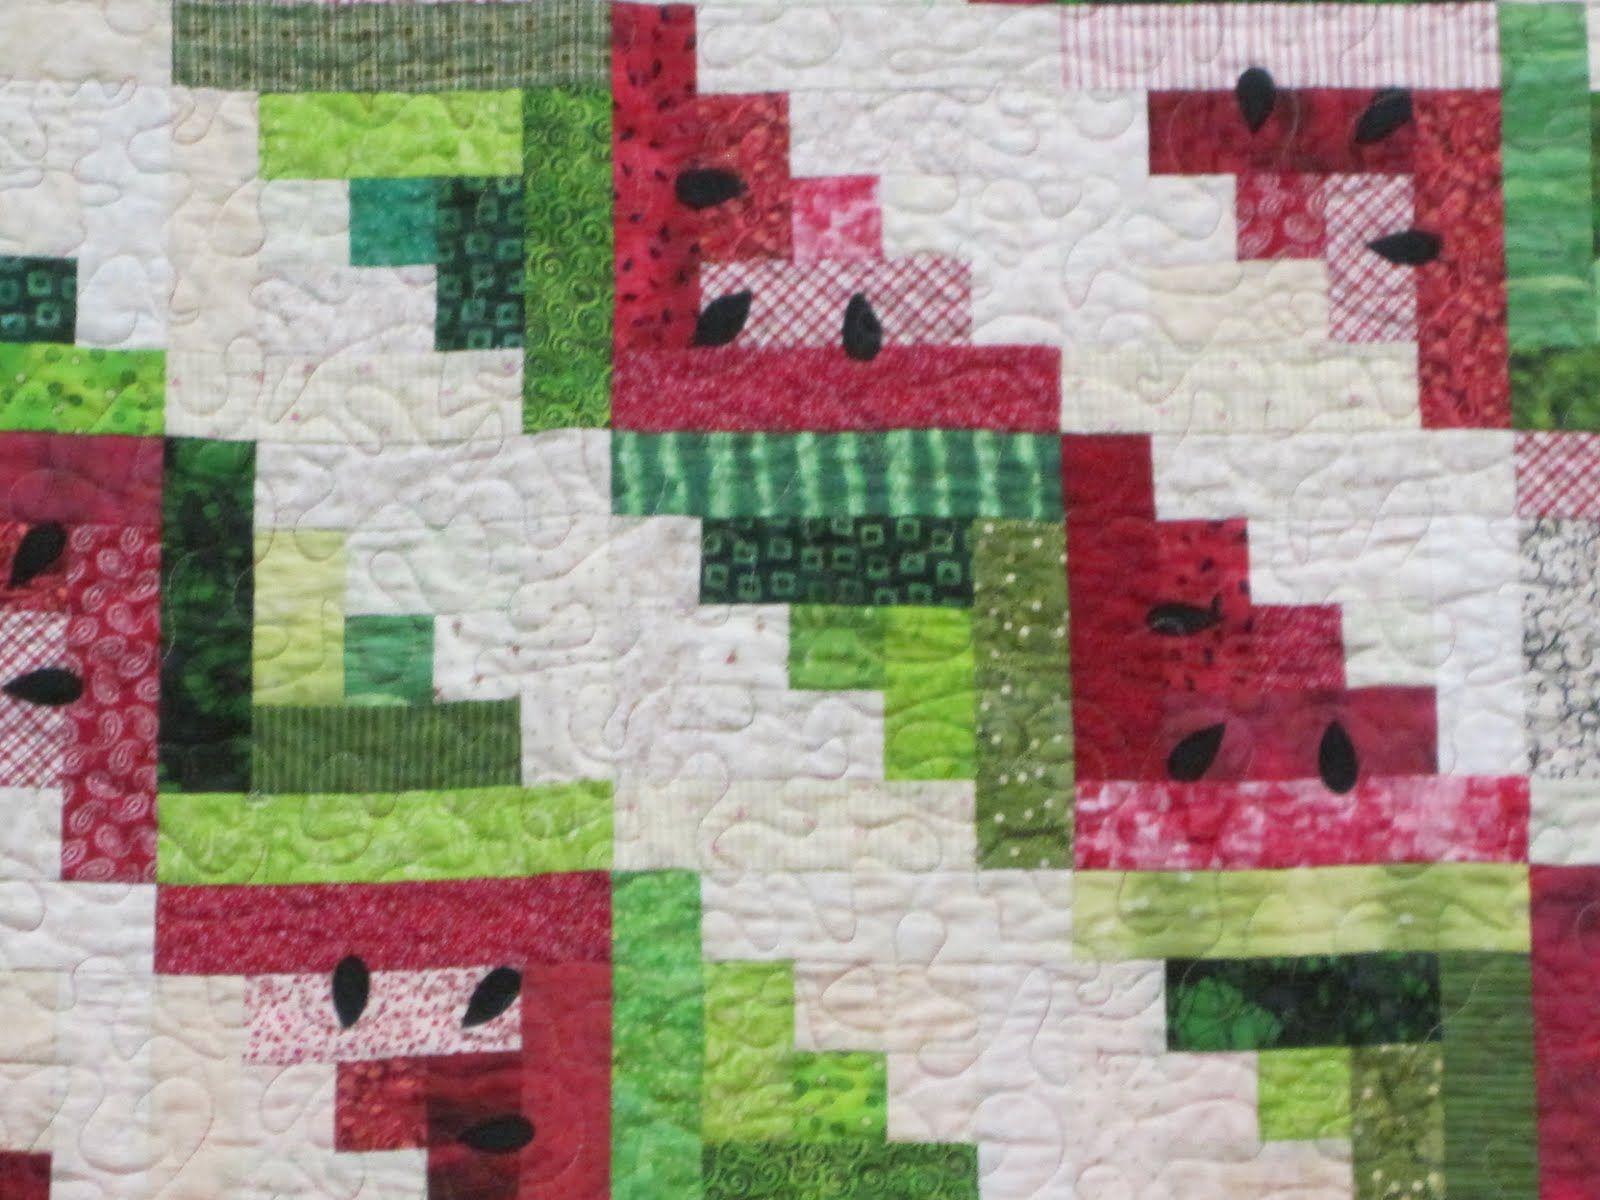 watermelon quilt- cuz i love watermelon! | Quilts | Pinterest ... : watermelon quilt pattern - Adamdwight.com